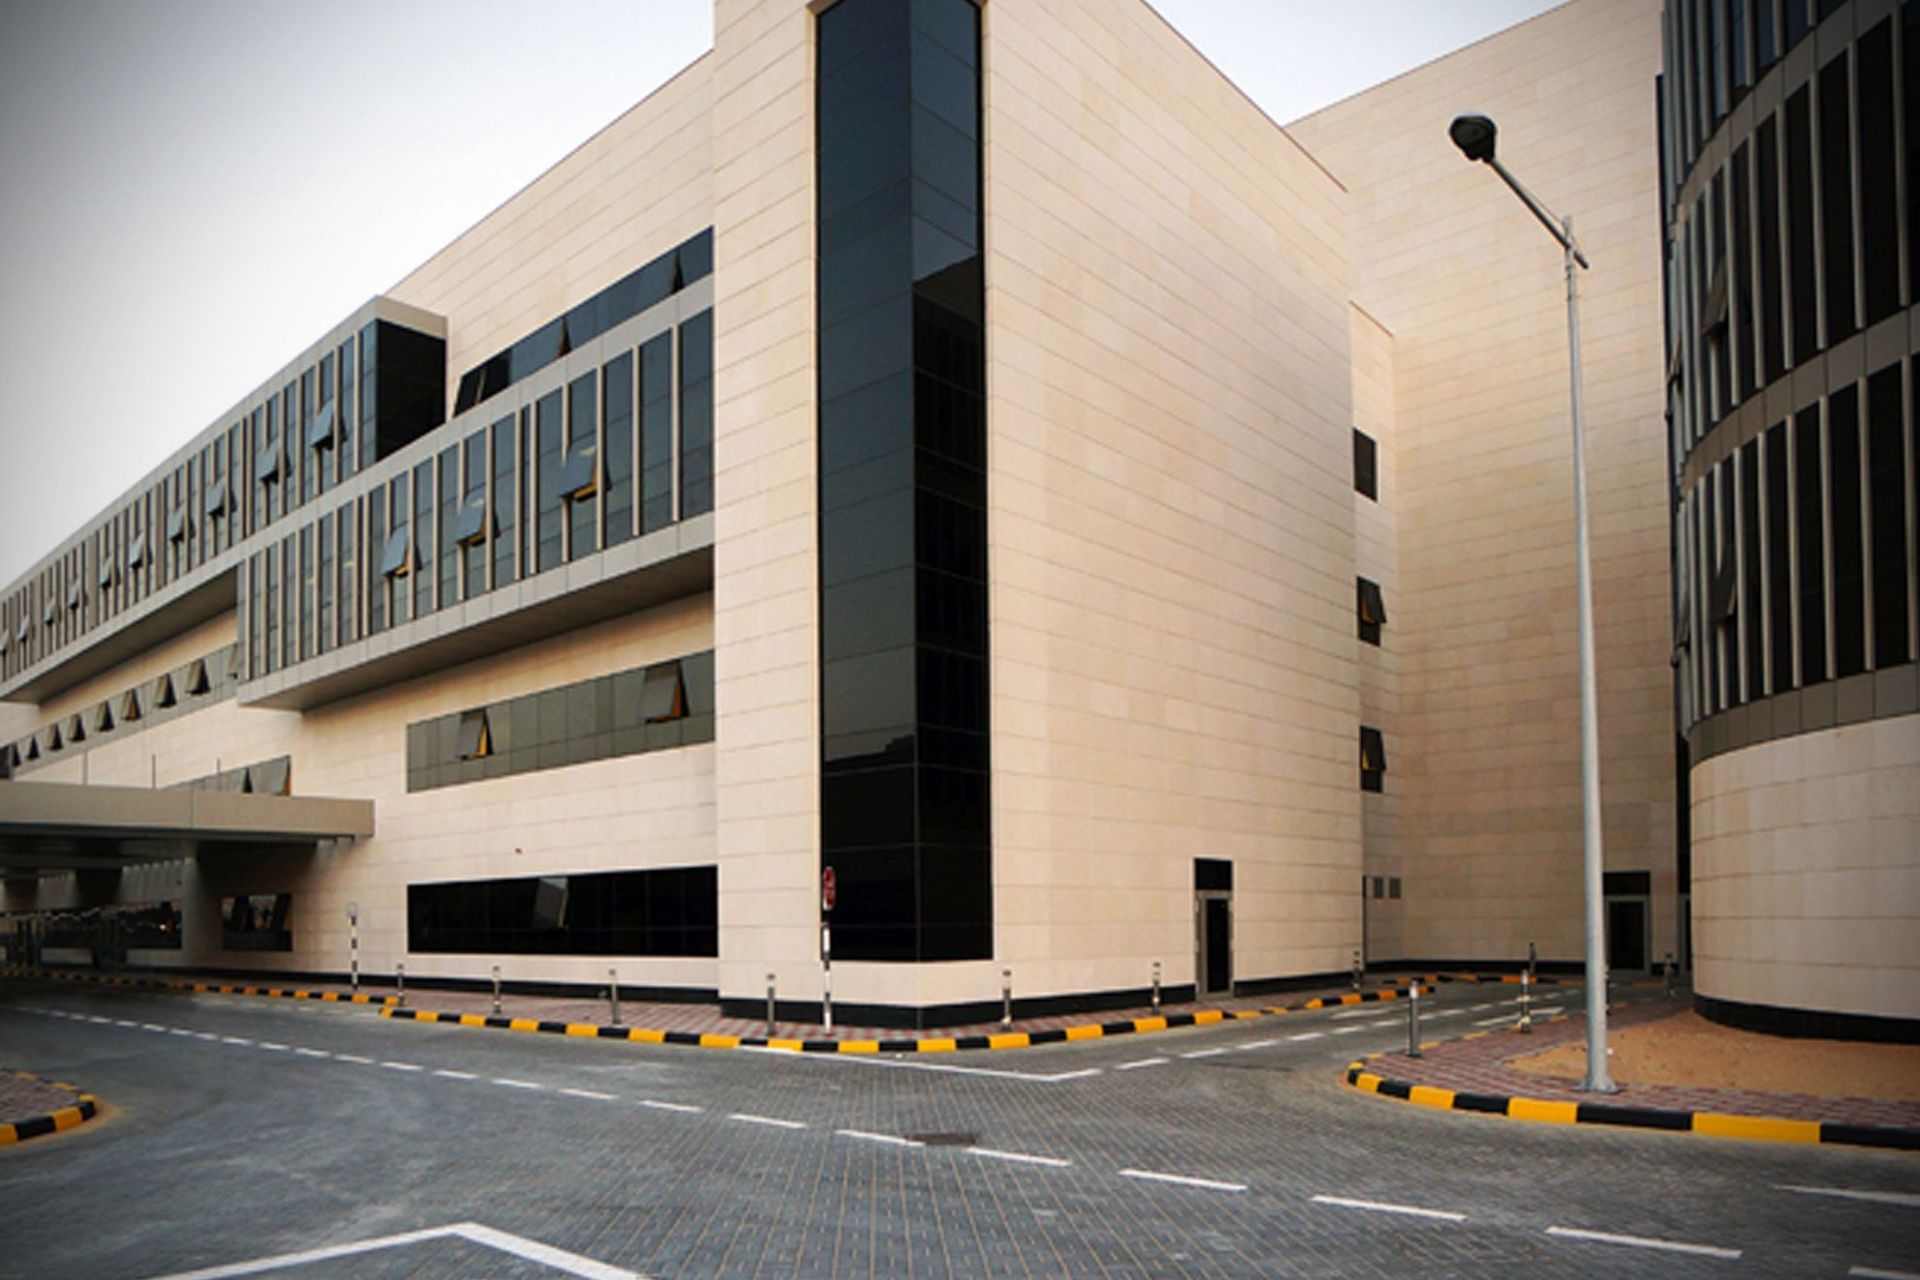 AL-QASSIMI-HOSPITAL